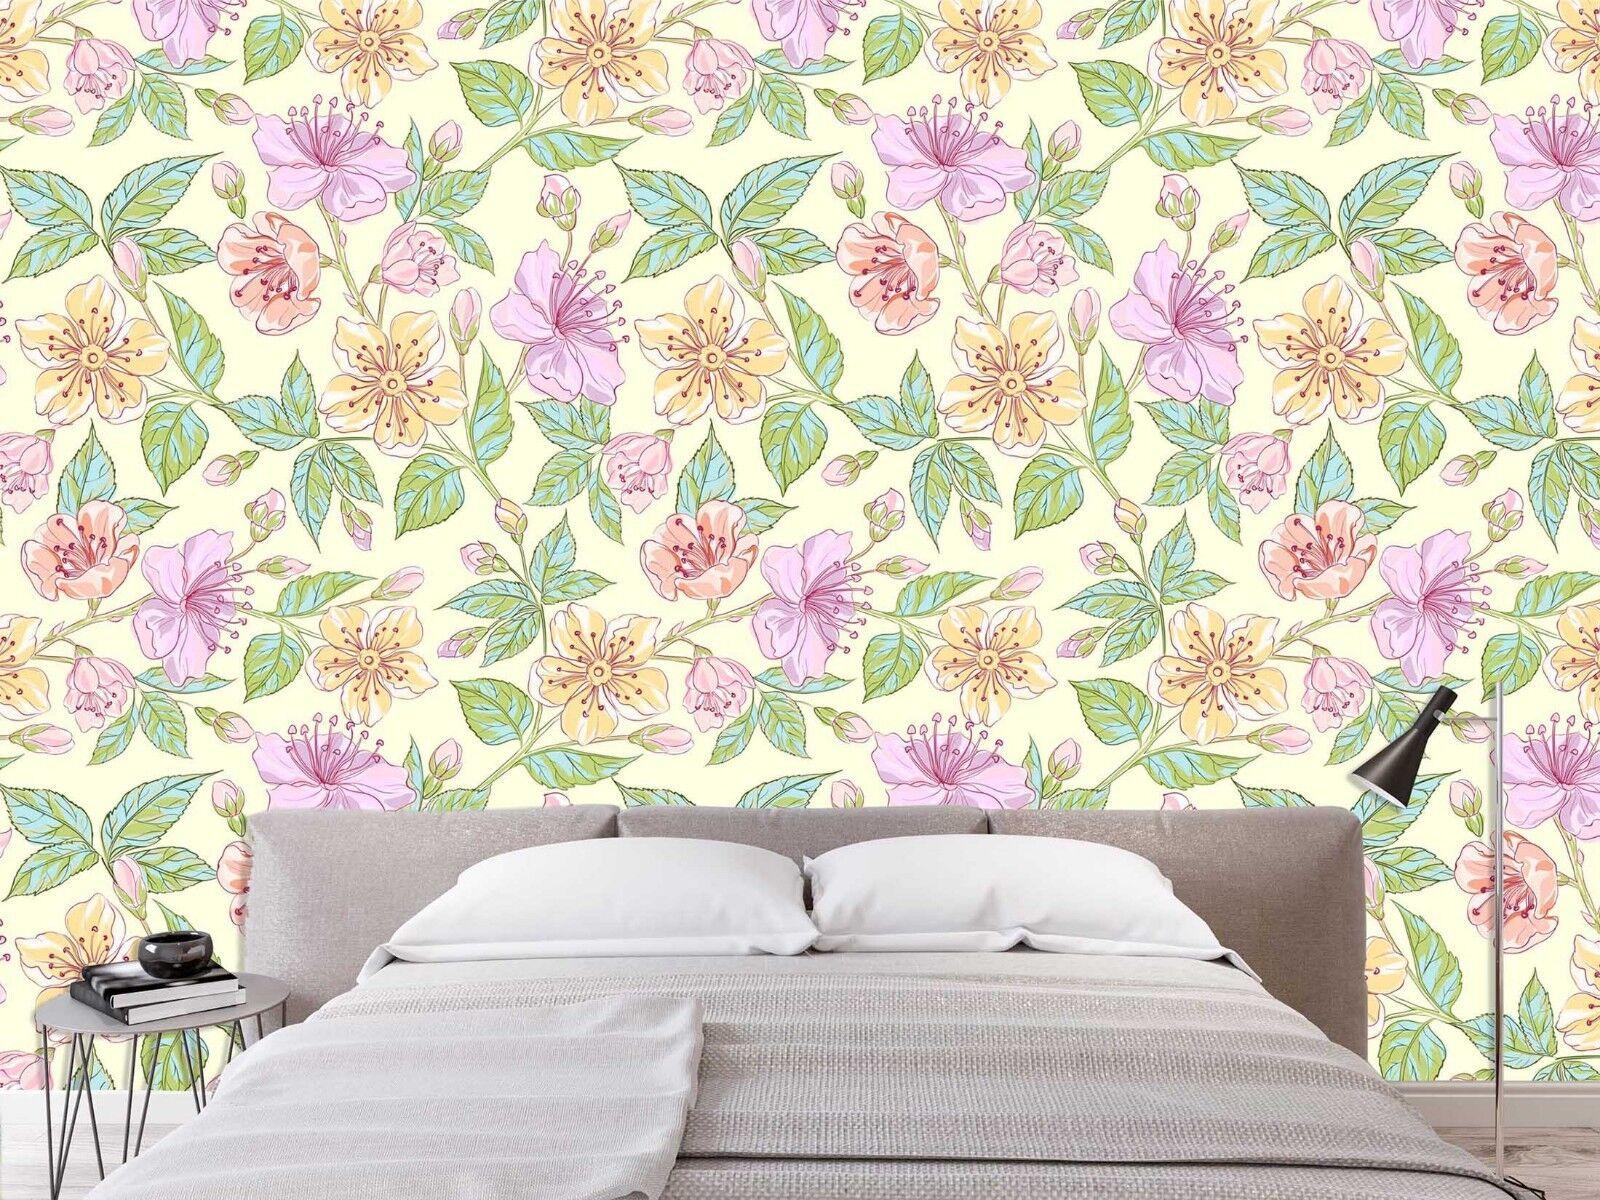 3D Rosa Flower Flower Flower 741 Wall Paper Print Wall Decal Deco Indoor Wall Murals US Summer ccc698